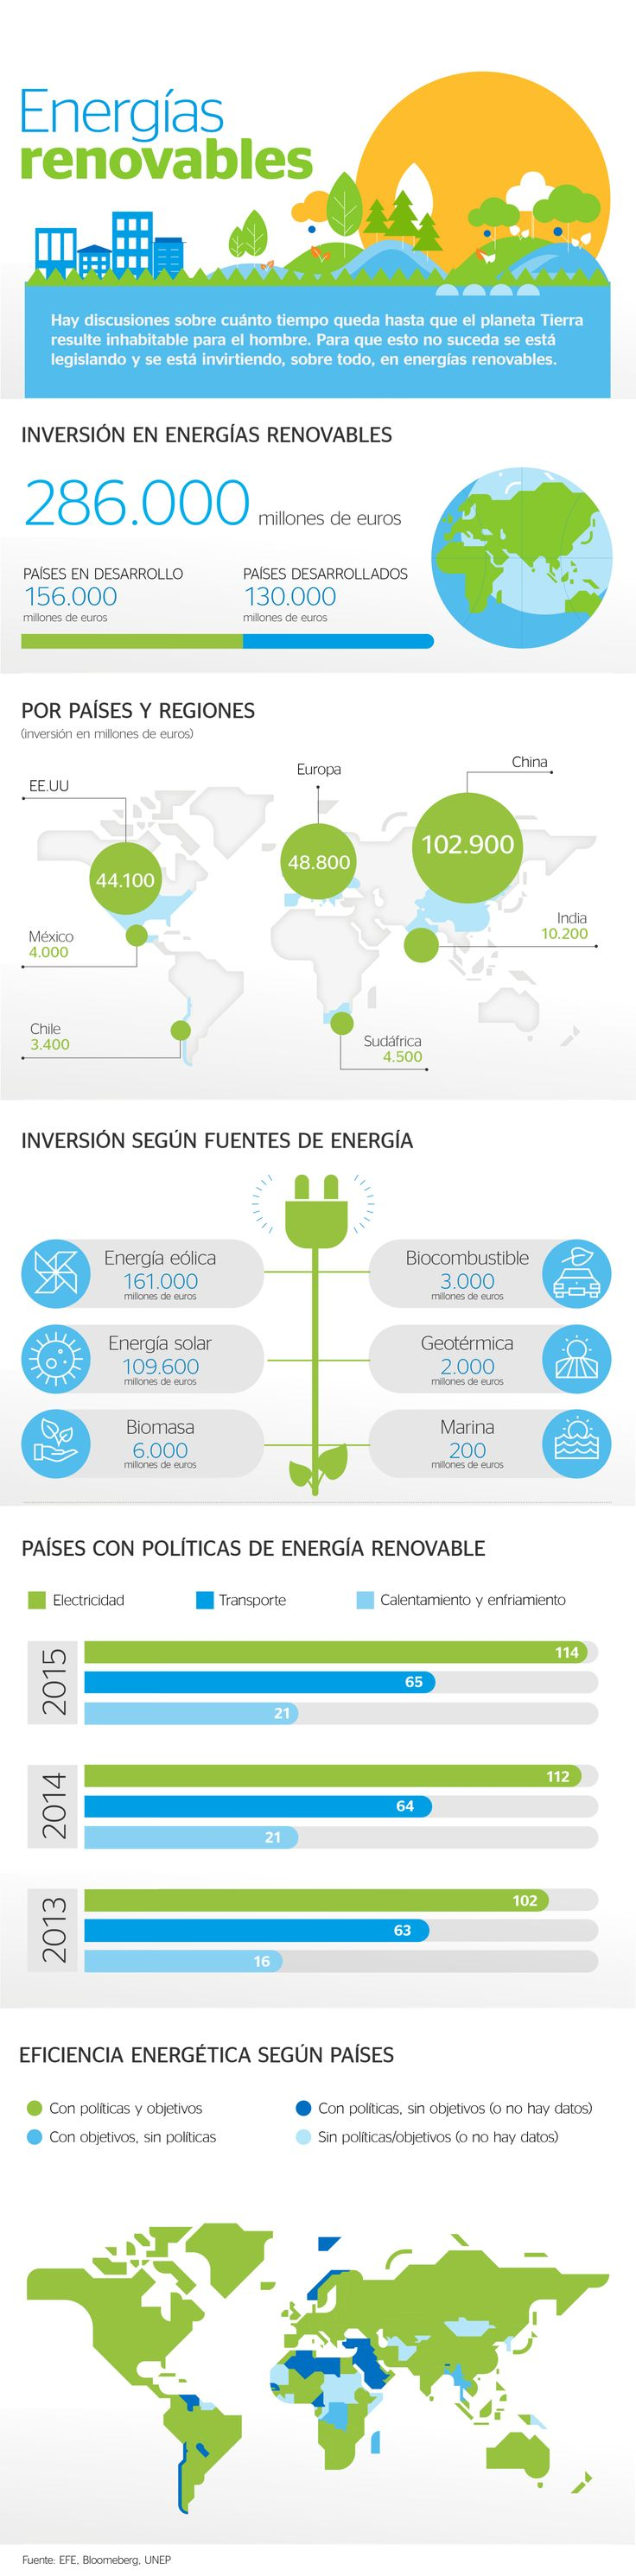 Energías renovables #infografia